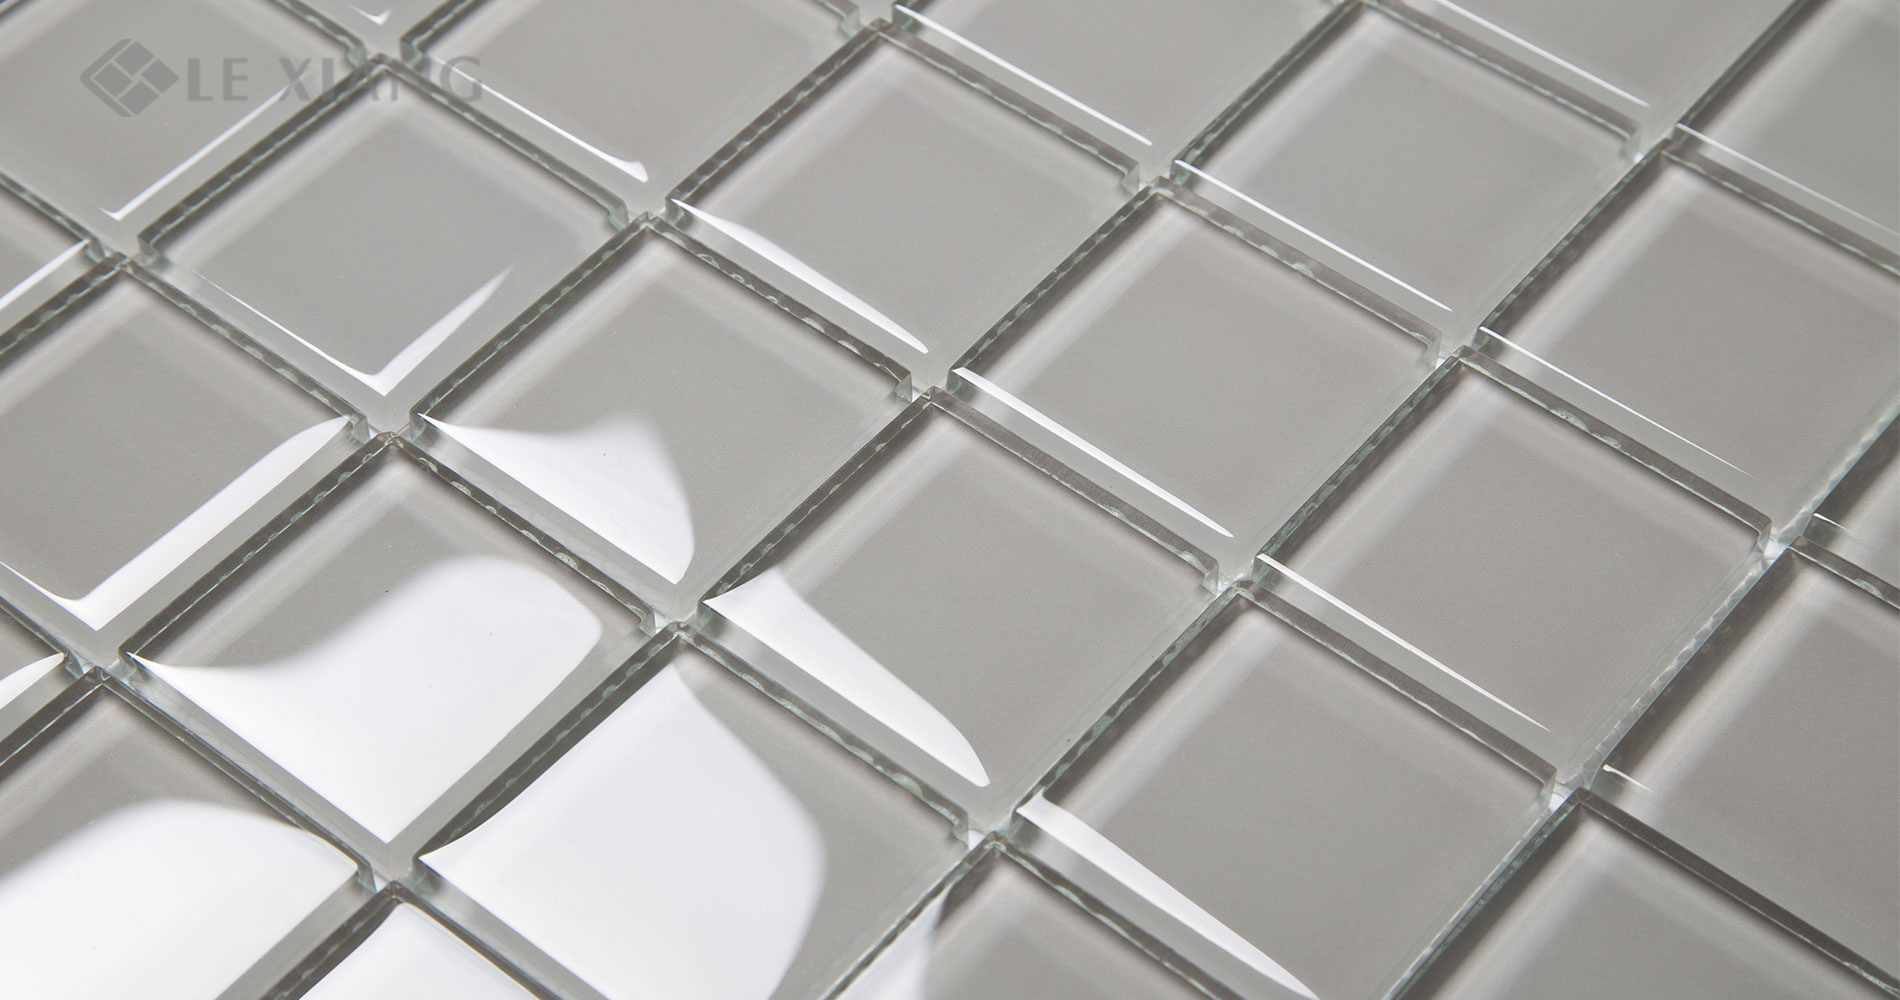 48mm-Square-Crystal-Glass-Mosaic-Backsplash-Tiles-12